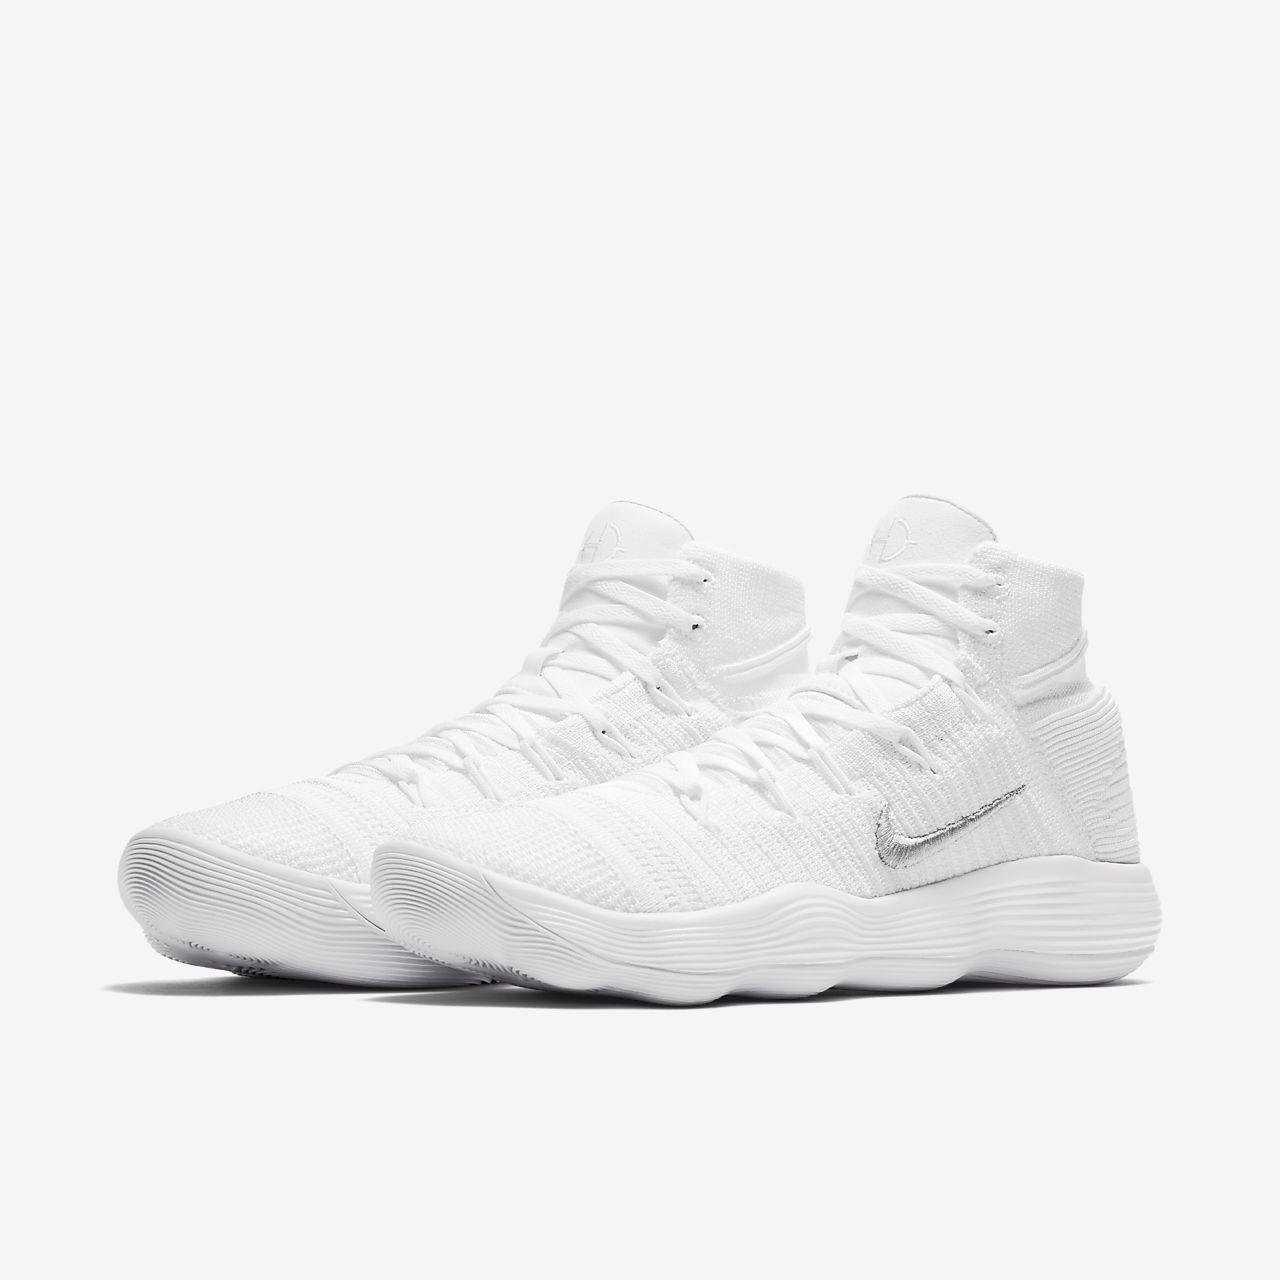 sale retailer a42ba 14fe6 Nike React Hyperdunk 2017 Flyknit Basketball Shoe